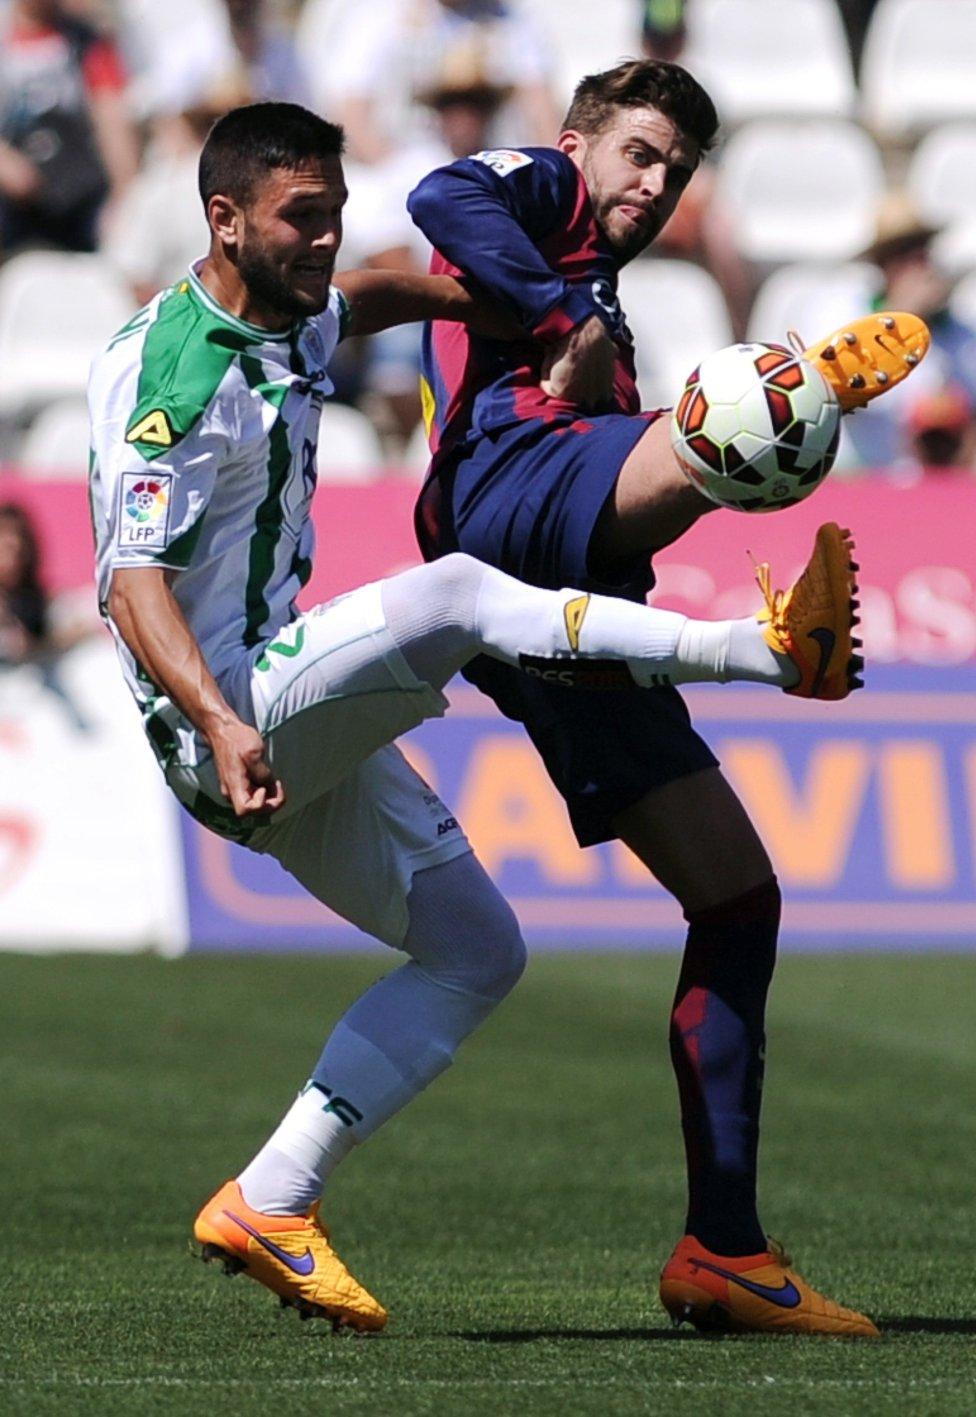 صور : مباراة قرطبة - برشلونة  0-8 ( 02-05-2015 )  1430577536_069101_1430577737_album_grande